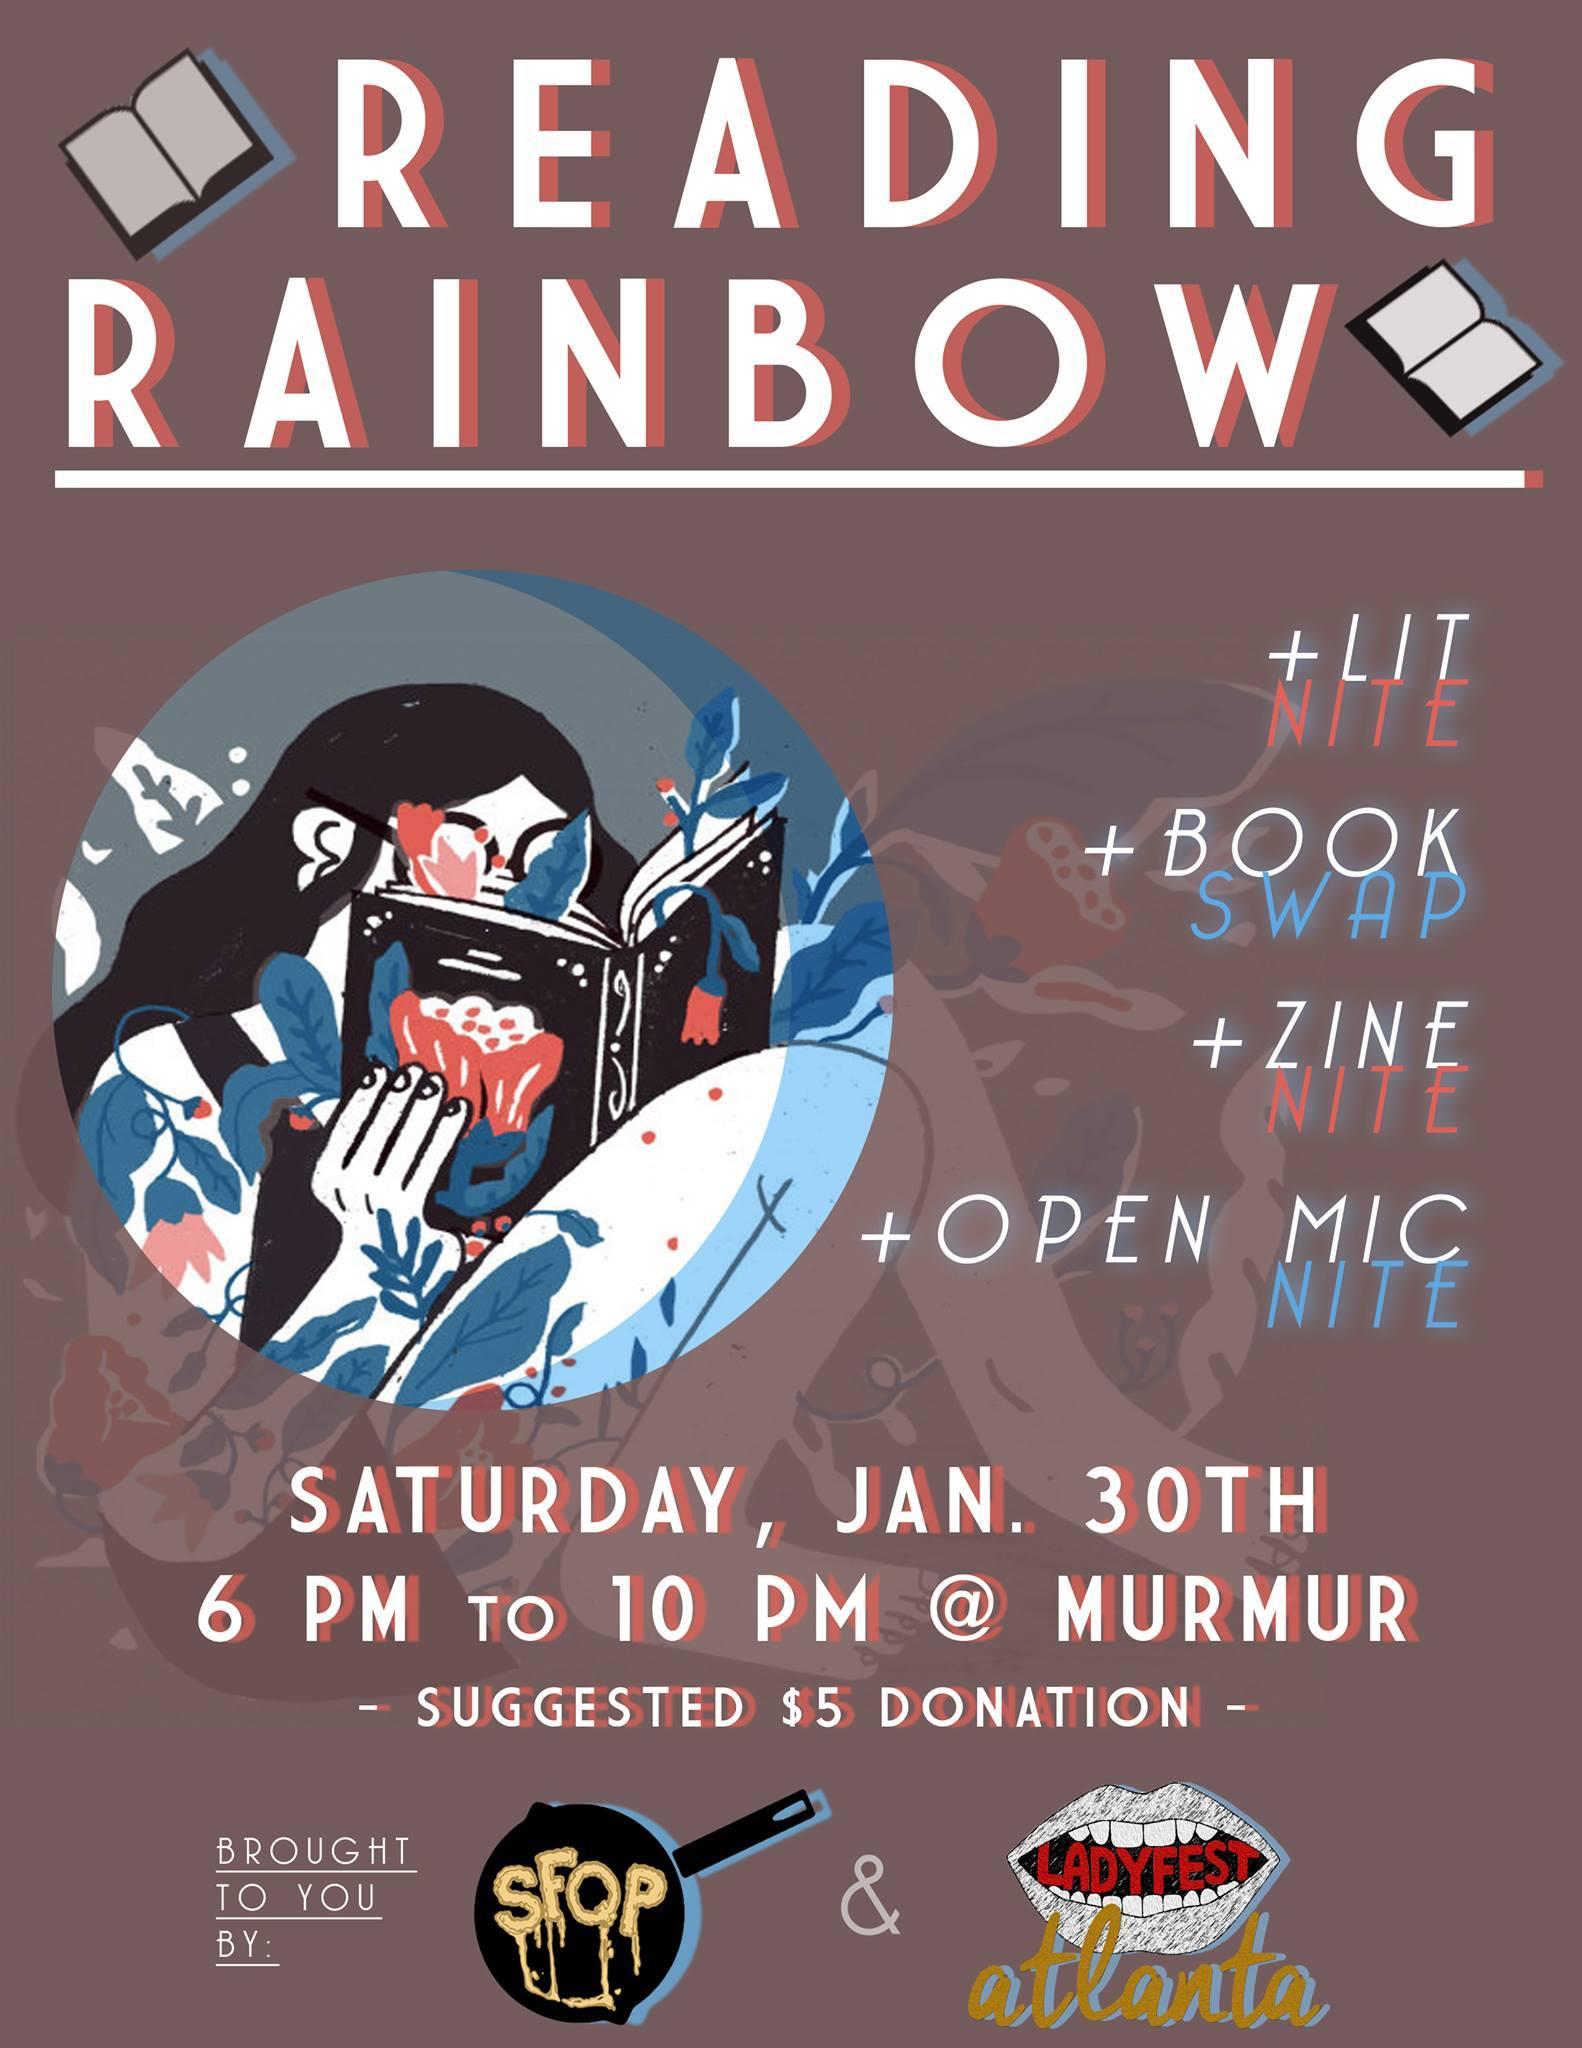 Ladyfest Atlanta & Southern Fried Queer Pride present READING RAINBOW: Radical Literature Pop-Up this Saturday night at Murmur.